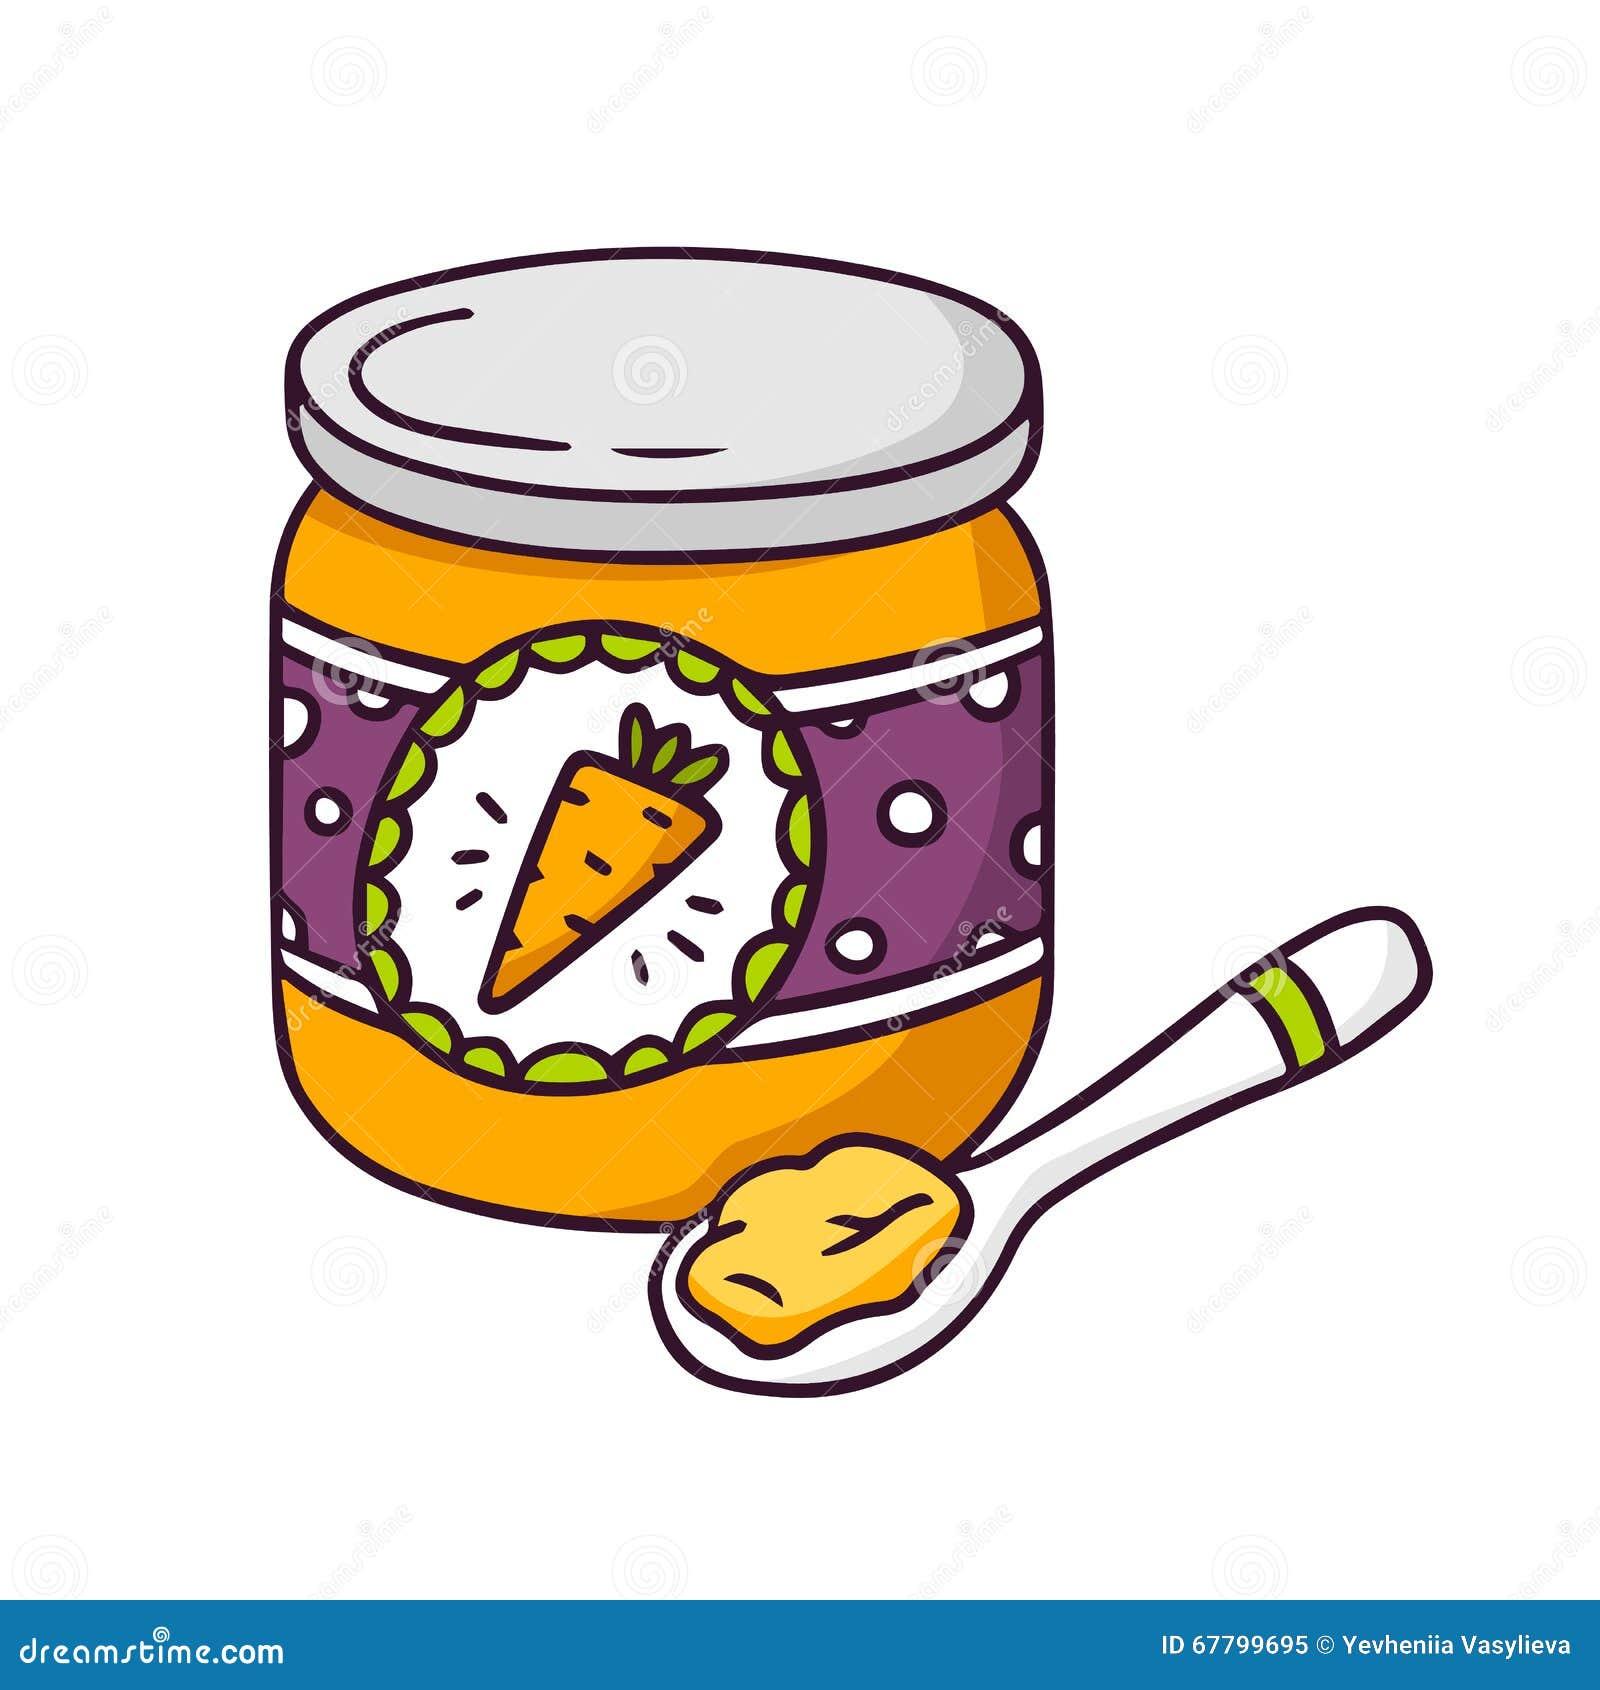 Baby Food Clip Art baby food jar stock illustrations, vectors ...